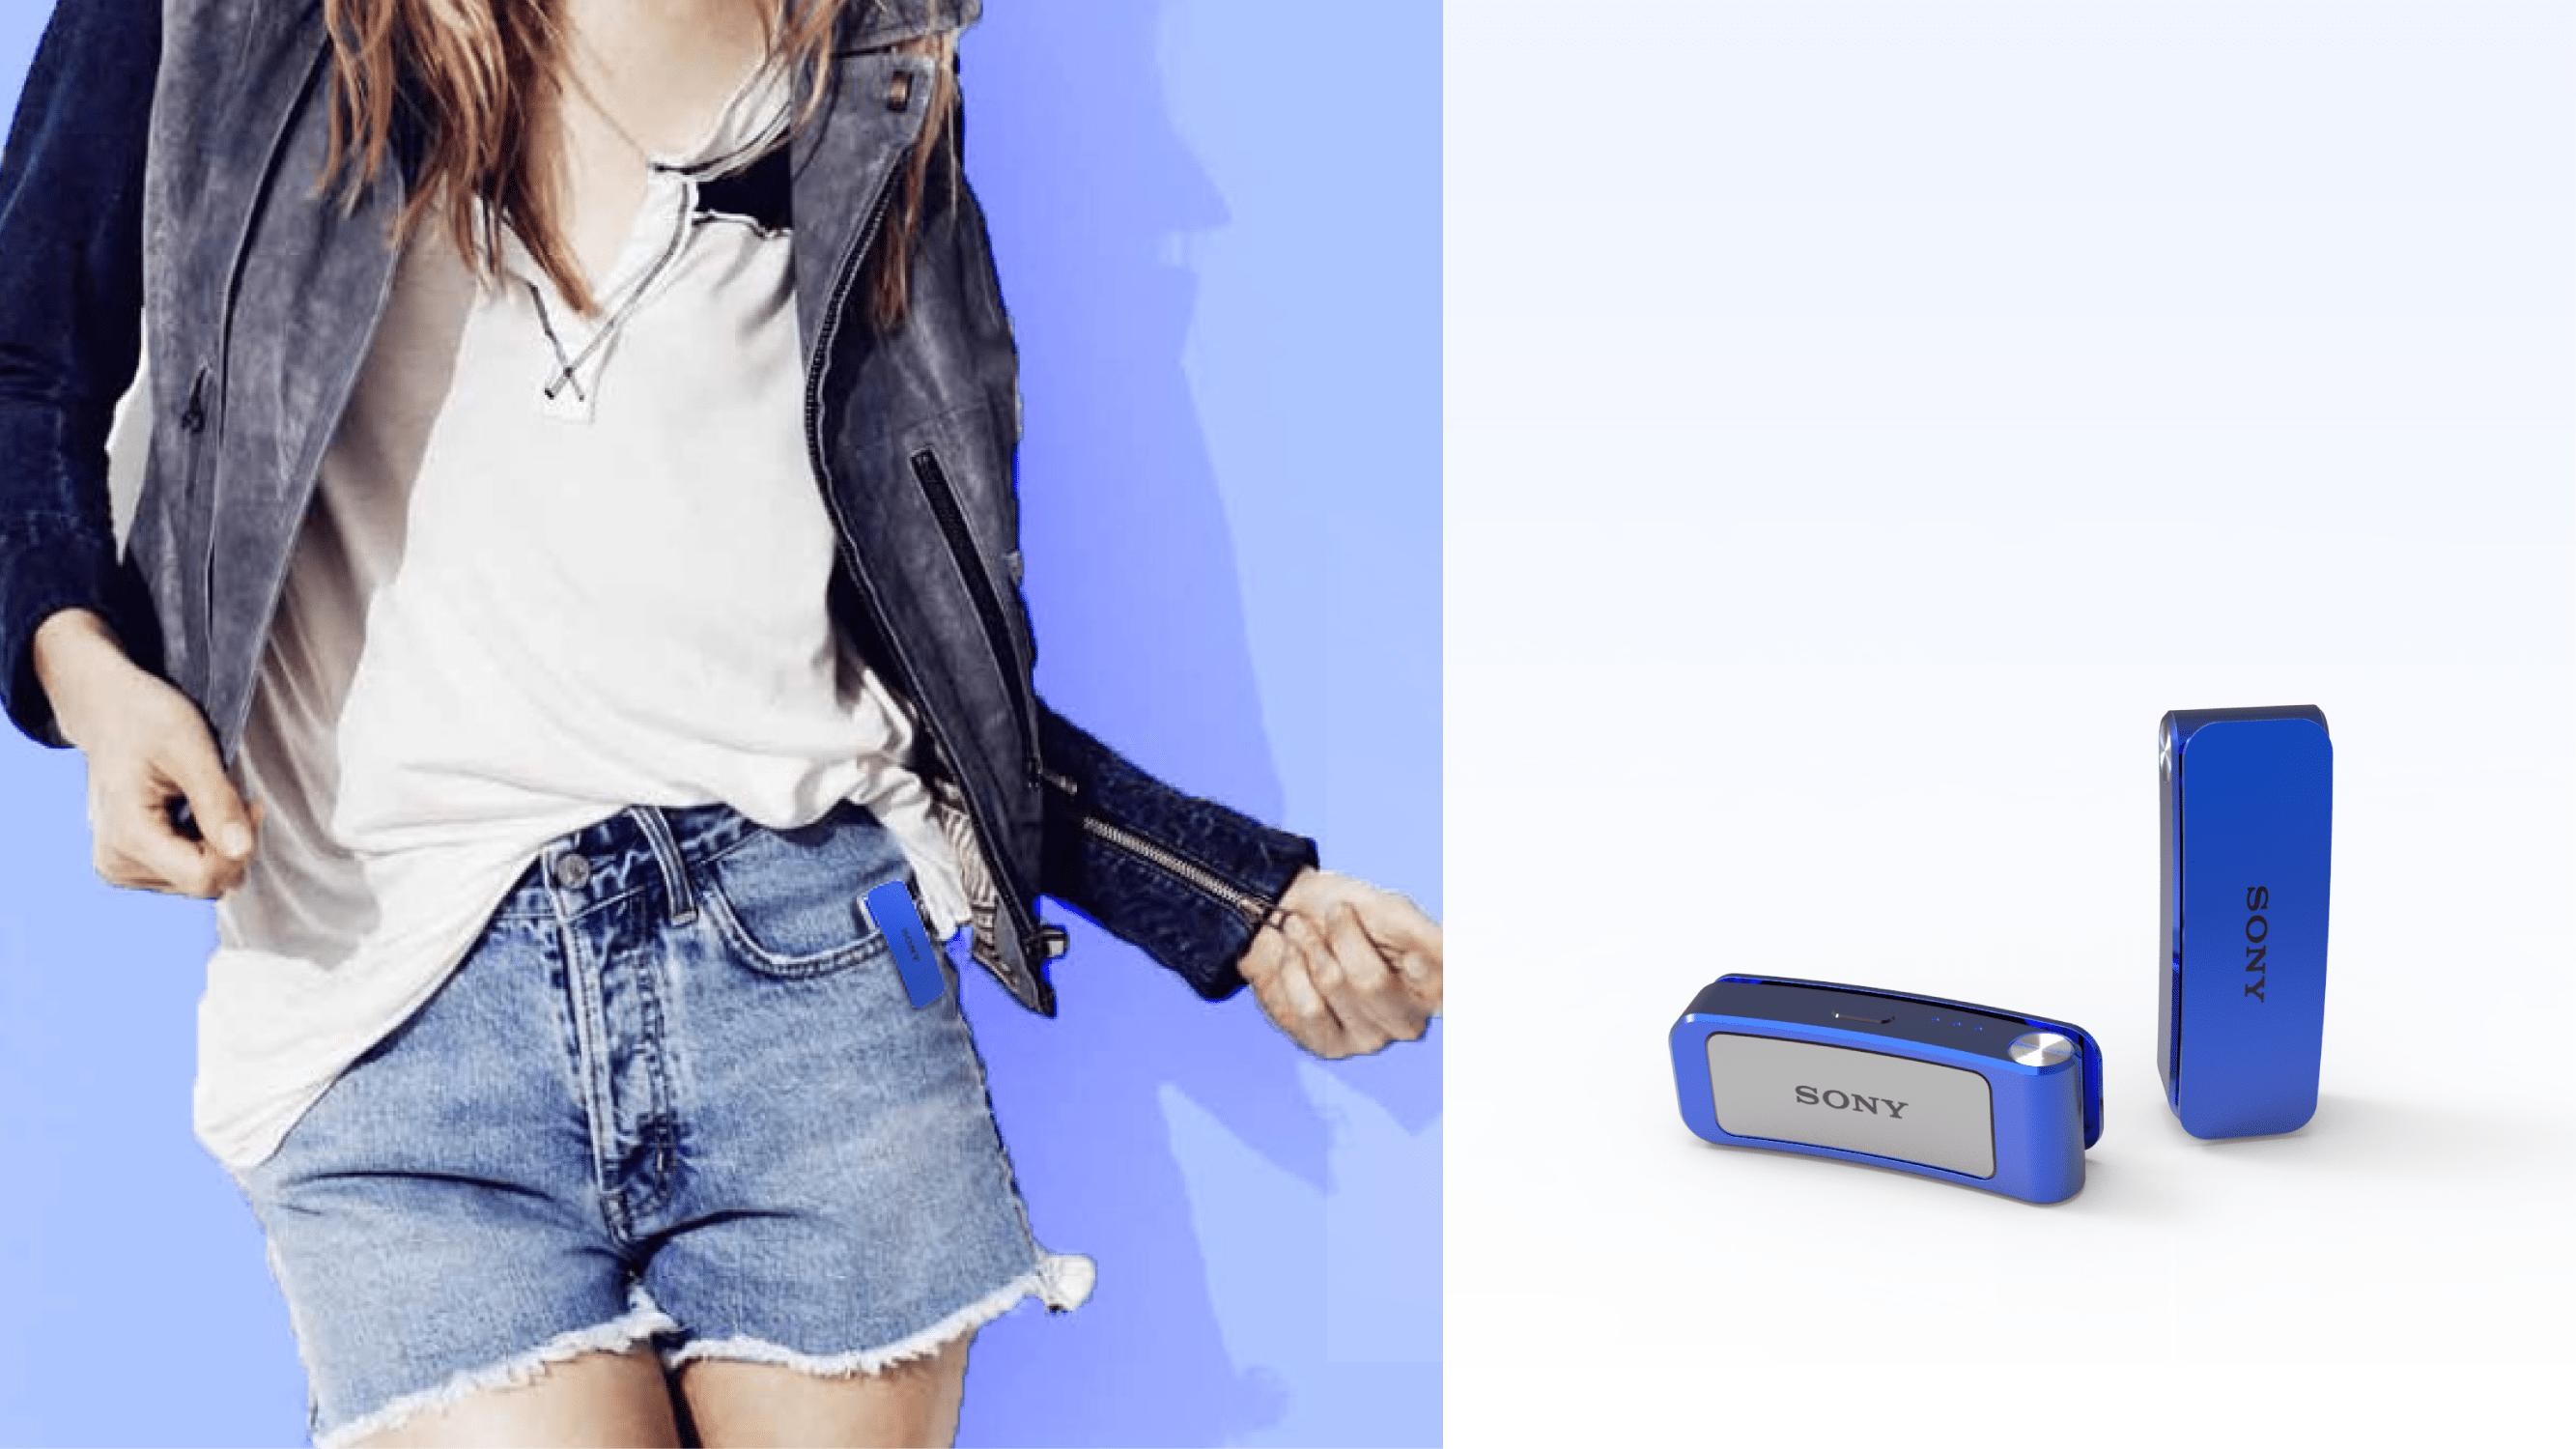 sony-smart-pod-clip